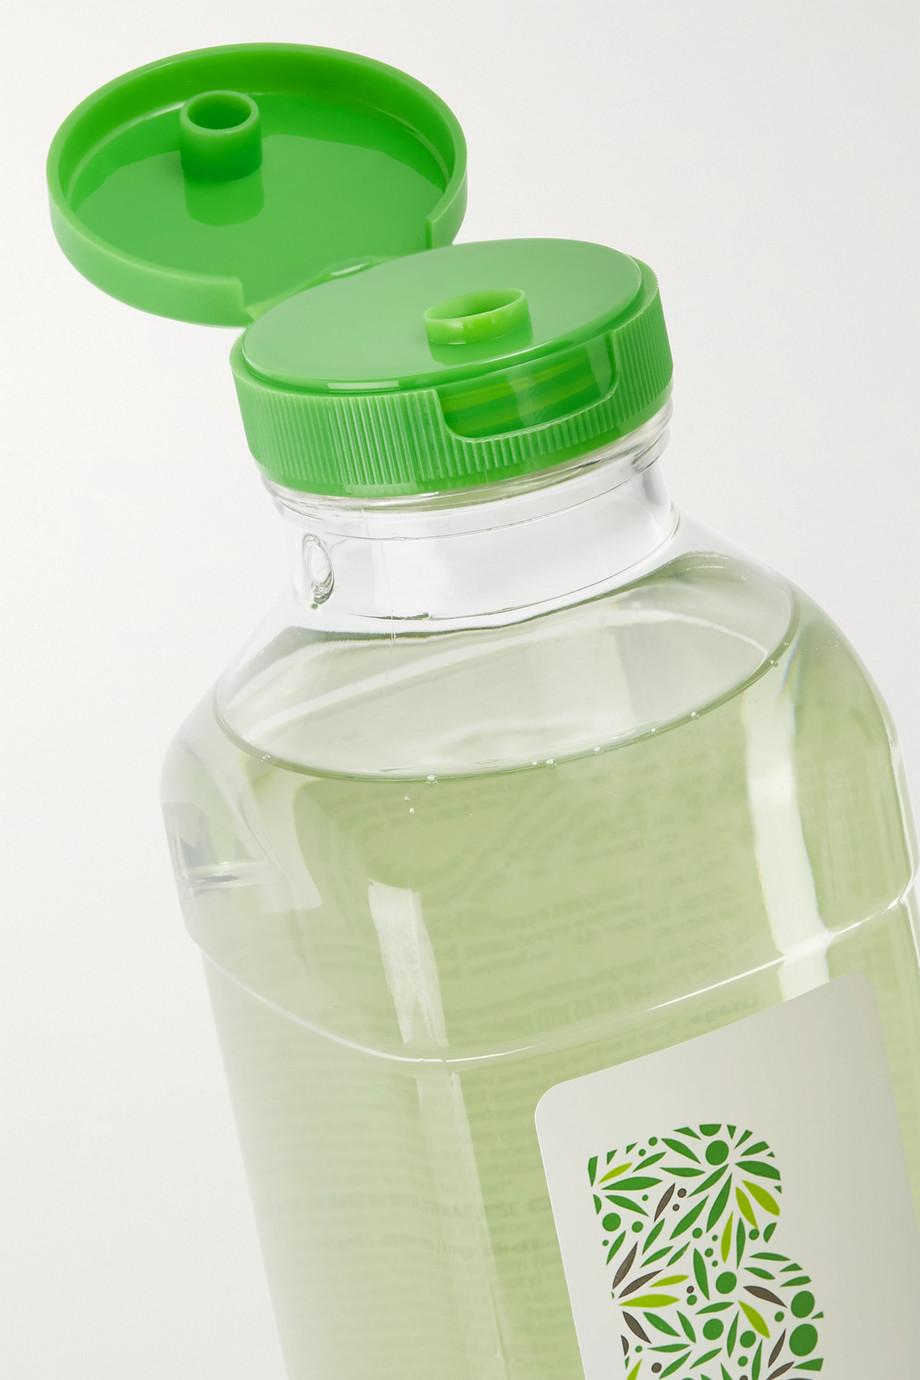 Briogeo Be Gentle, Be Kind Matcha + Apple Replenishing Superfood Shampoo, 369ml